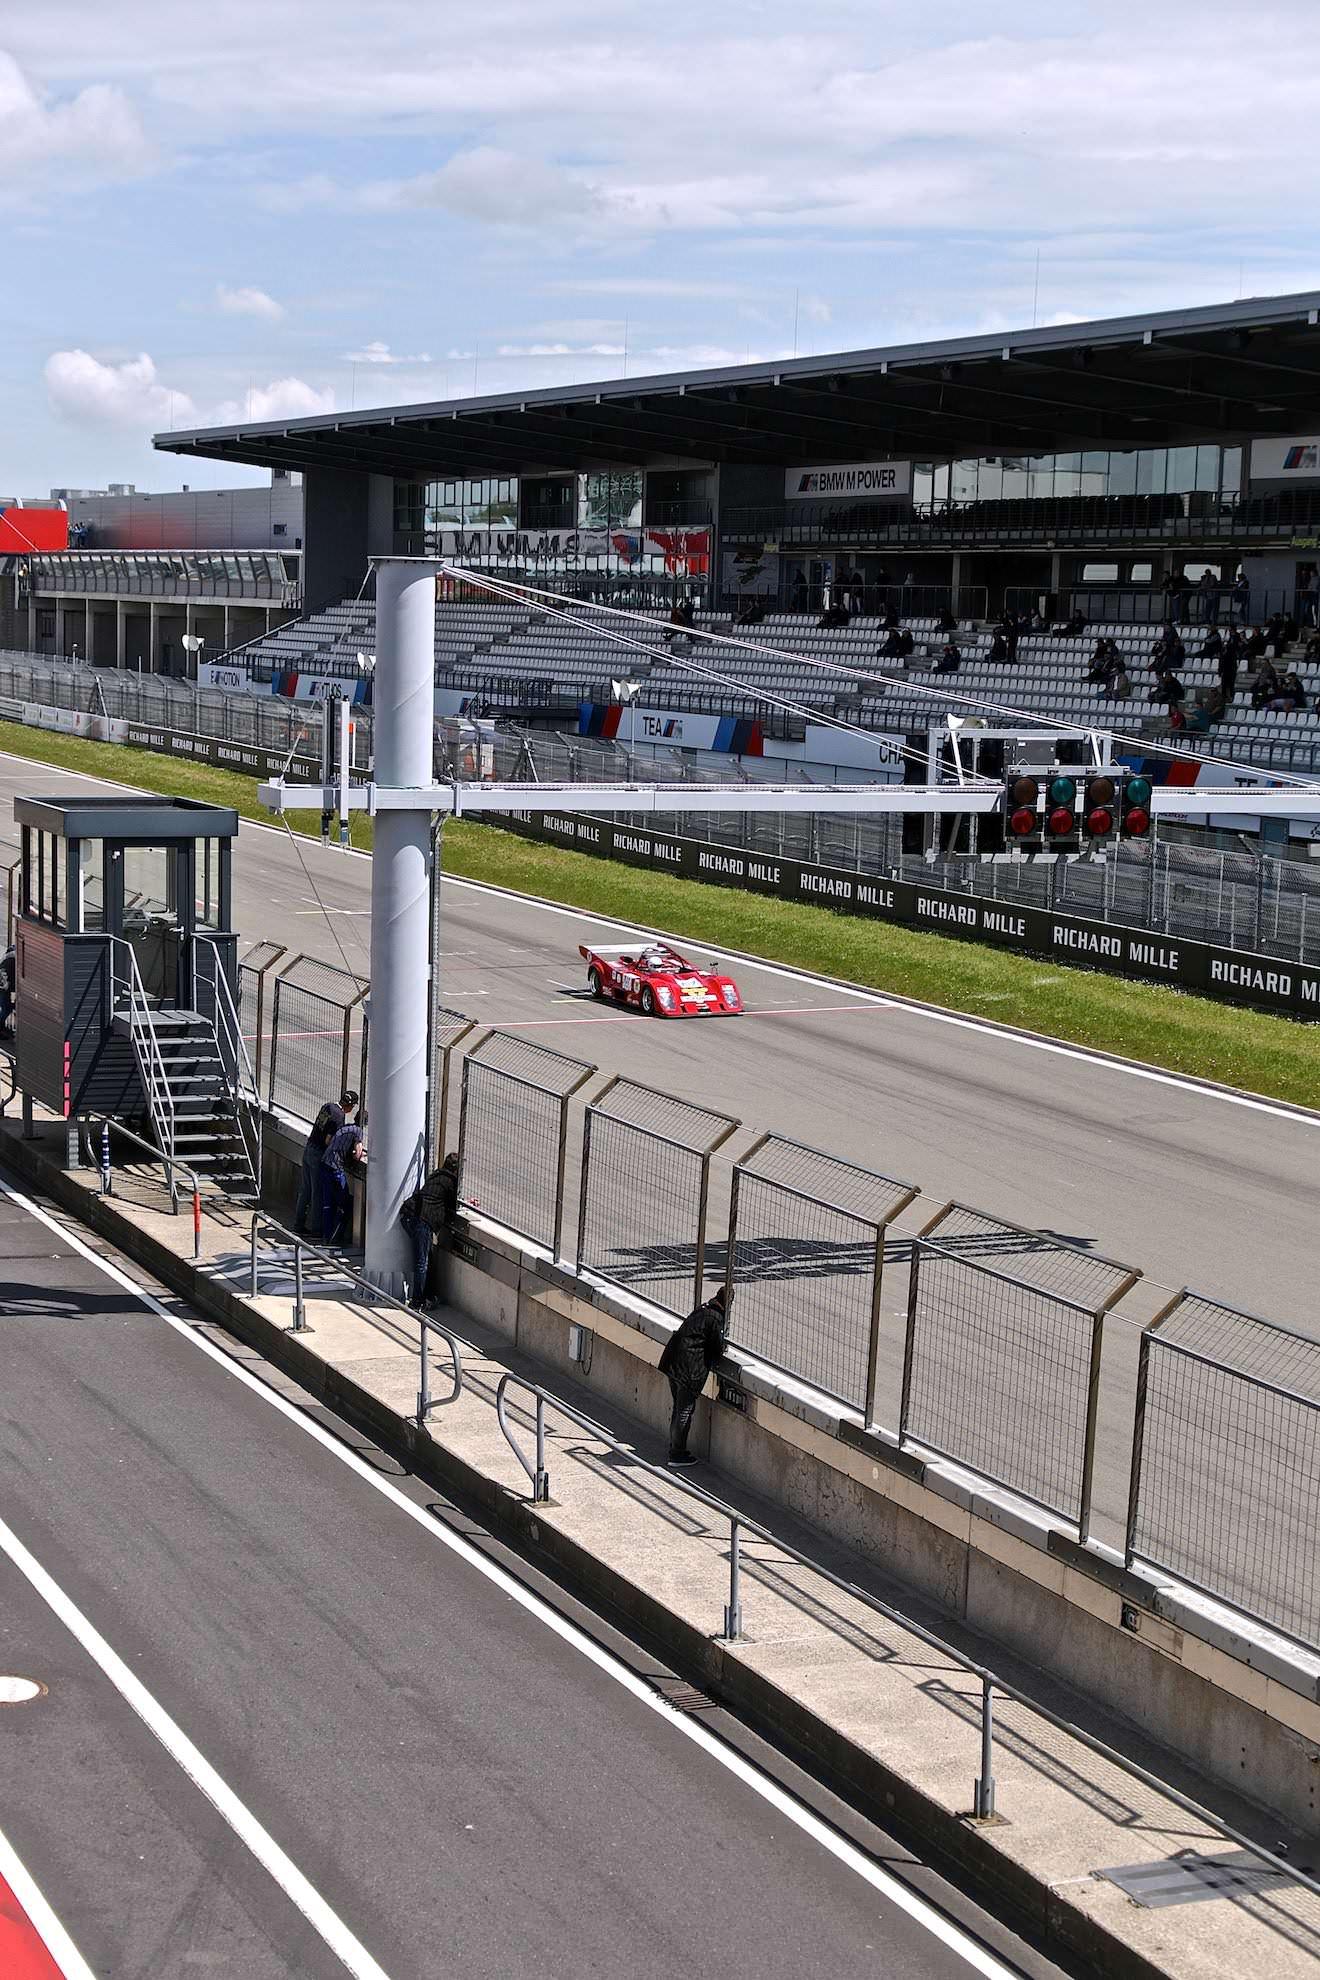 Richard Mille Nürburgring Classic 2019